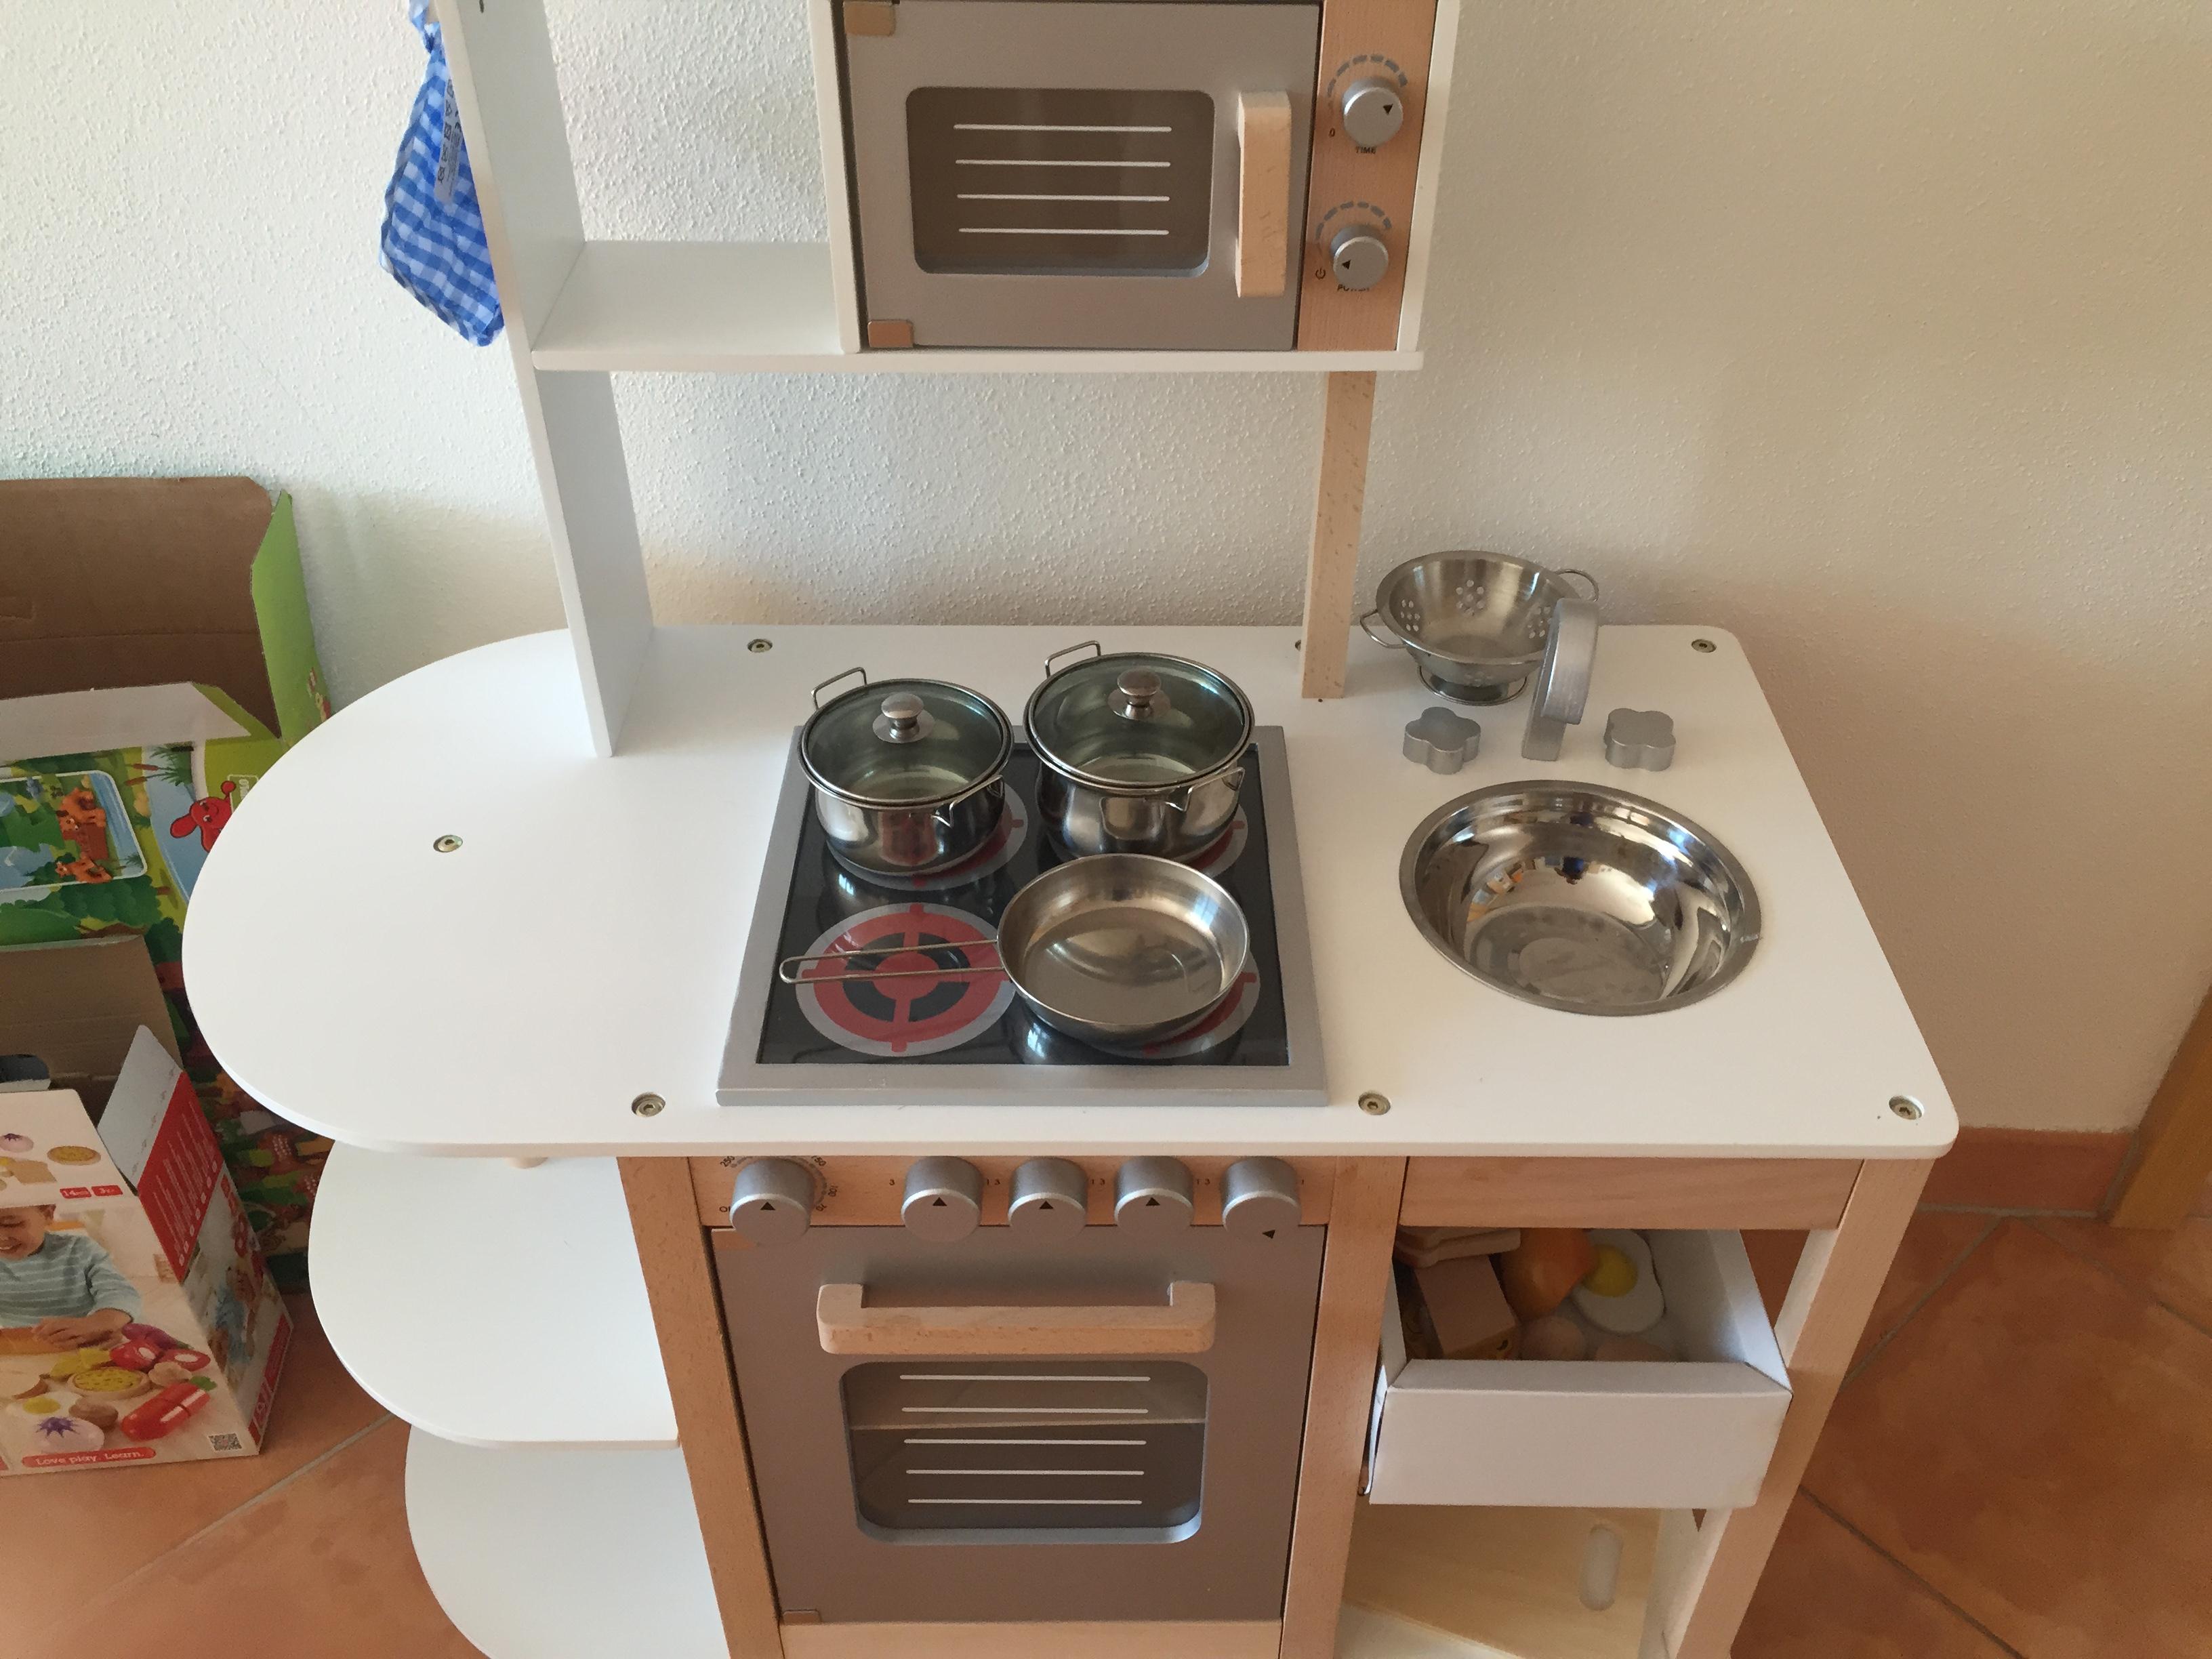 produktvorstellung sun kinderk che piratenprinzessin. Black Bedroom Furniture Sets. Home Design Ideas